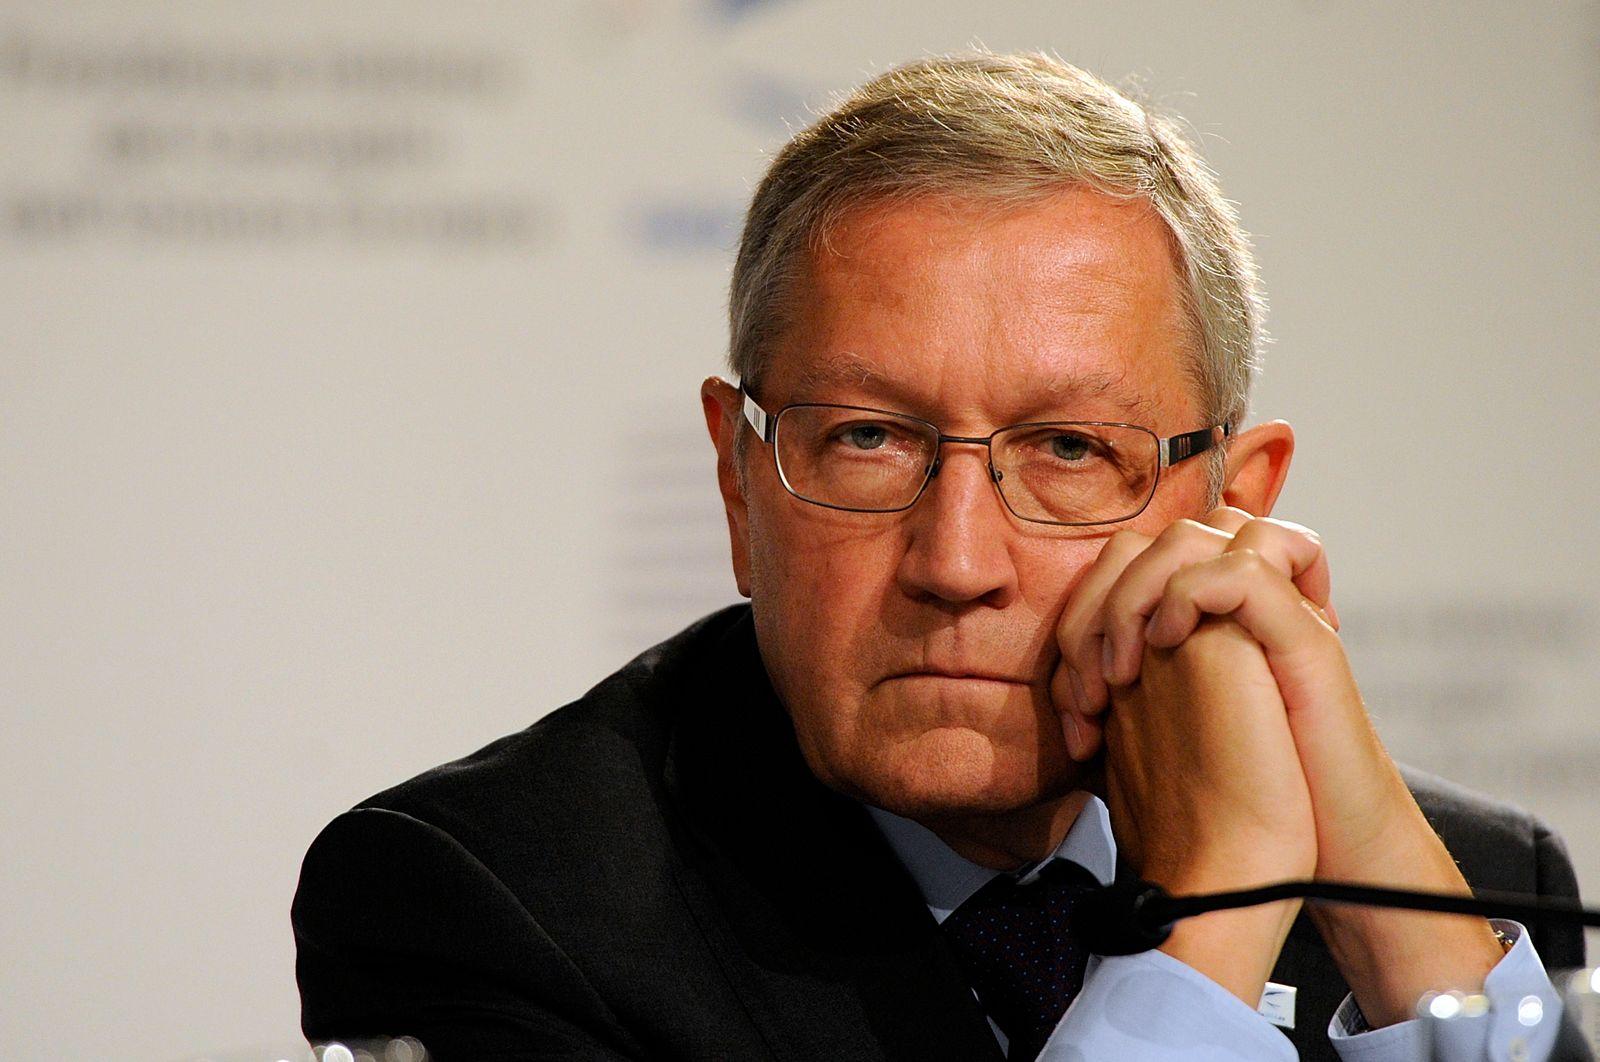 Griechenland/ Verhandlungen/ Klaus Regling